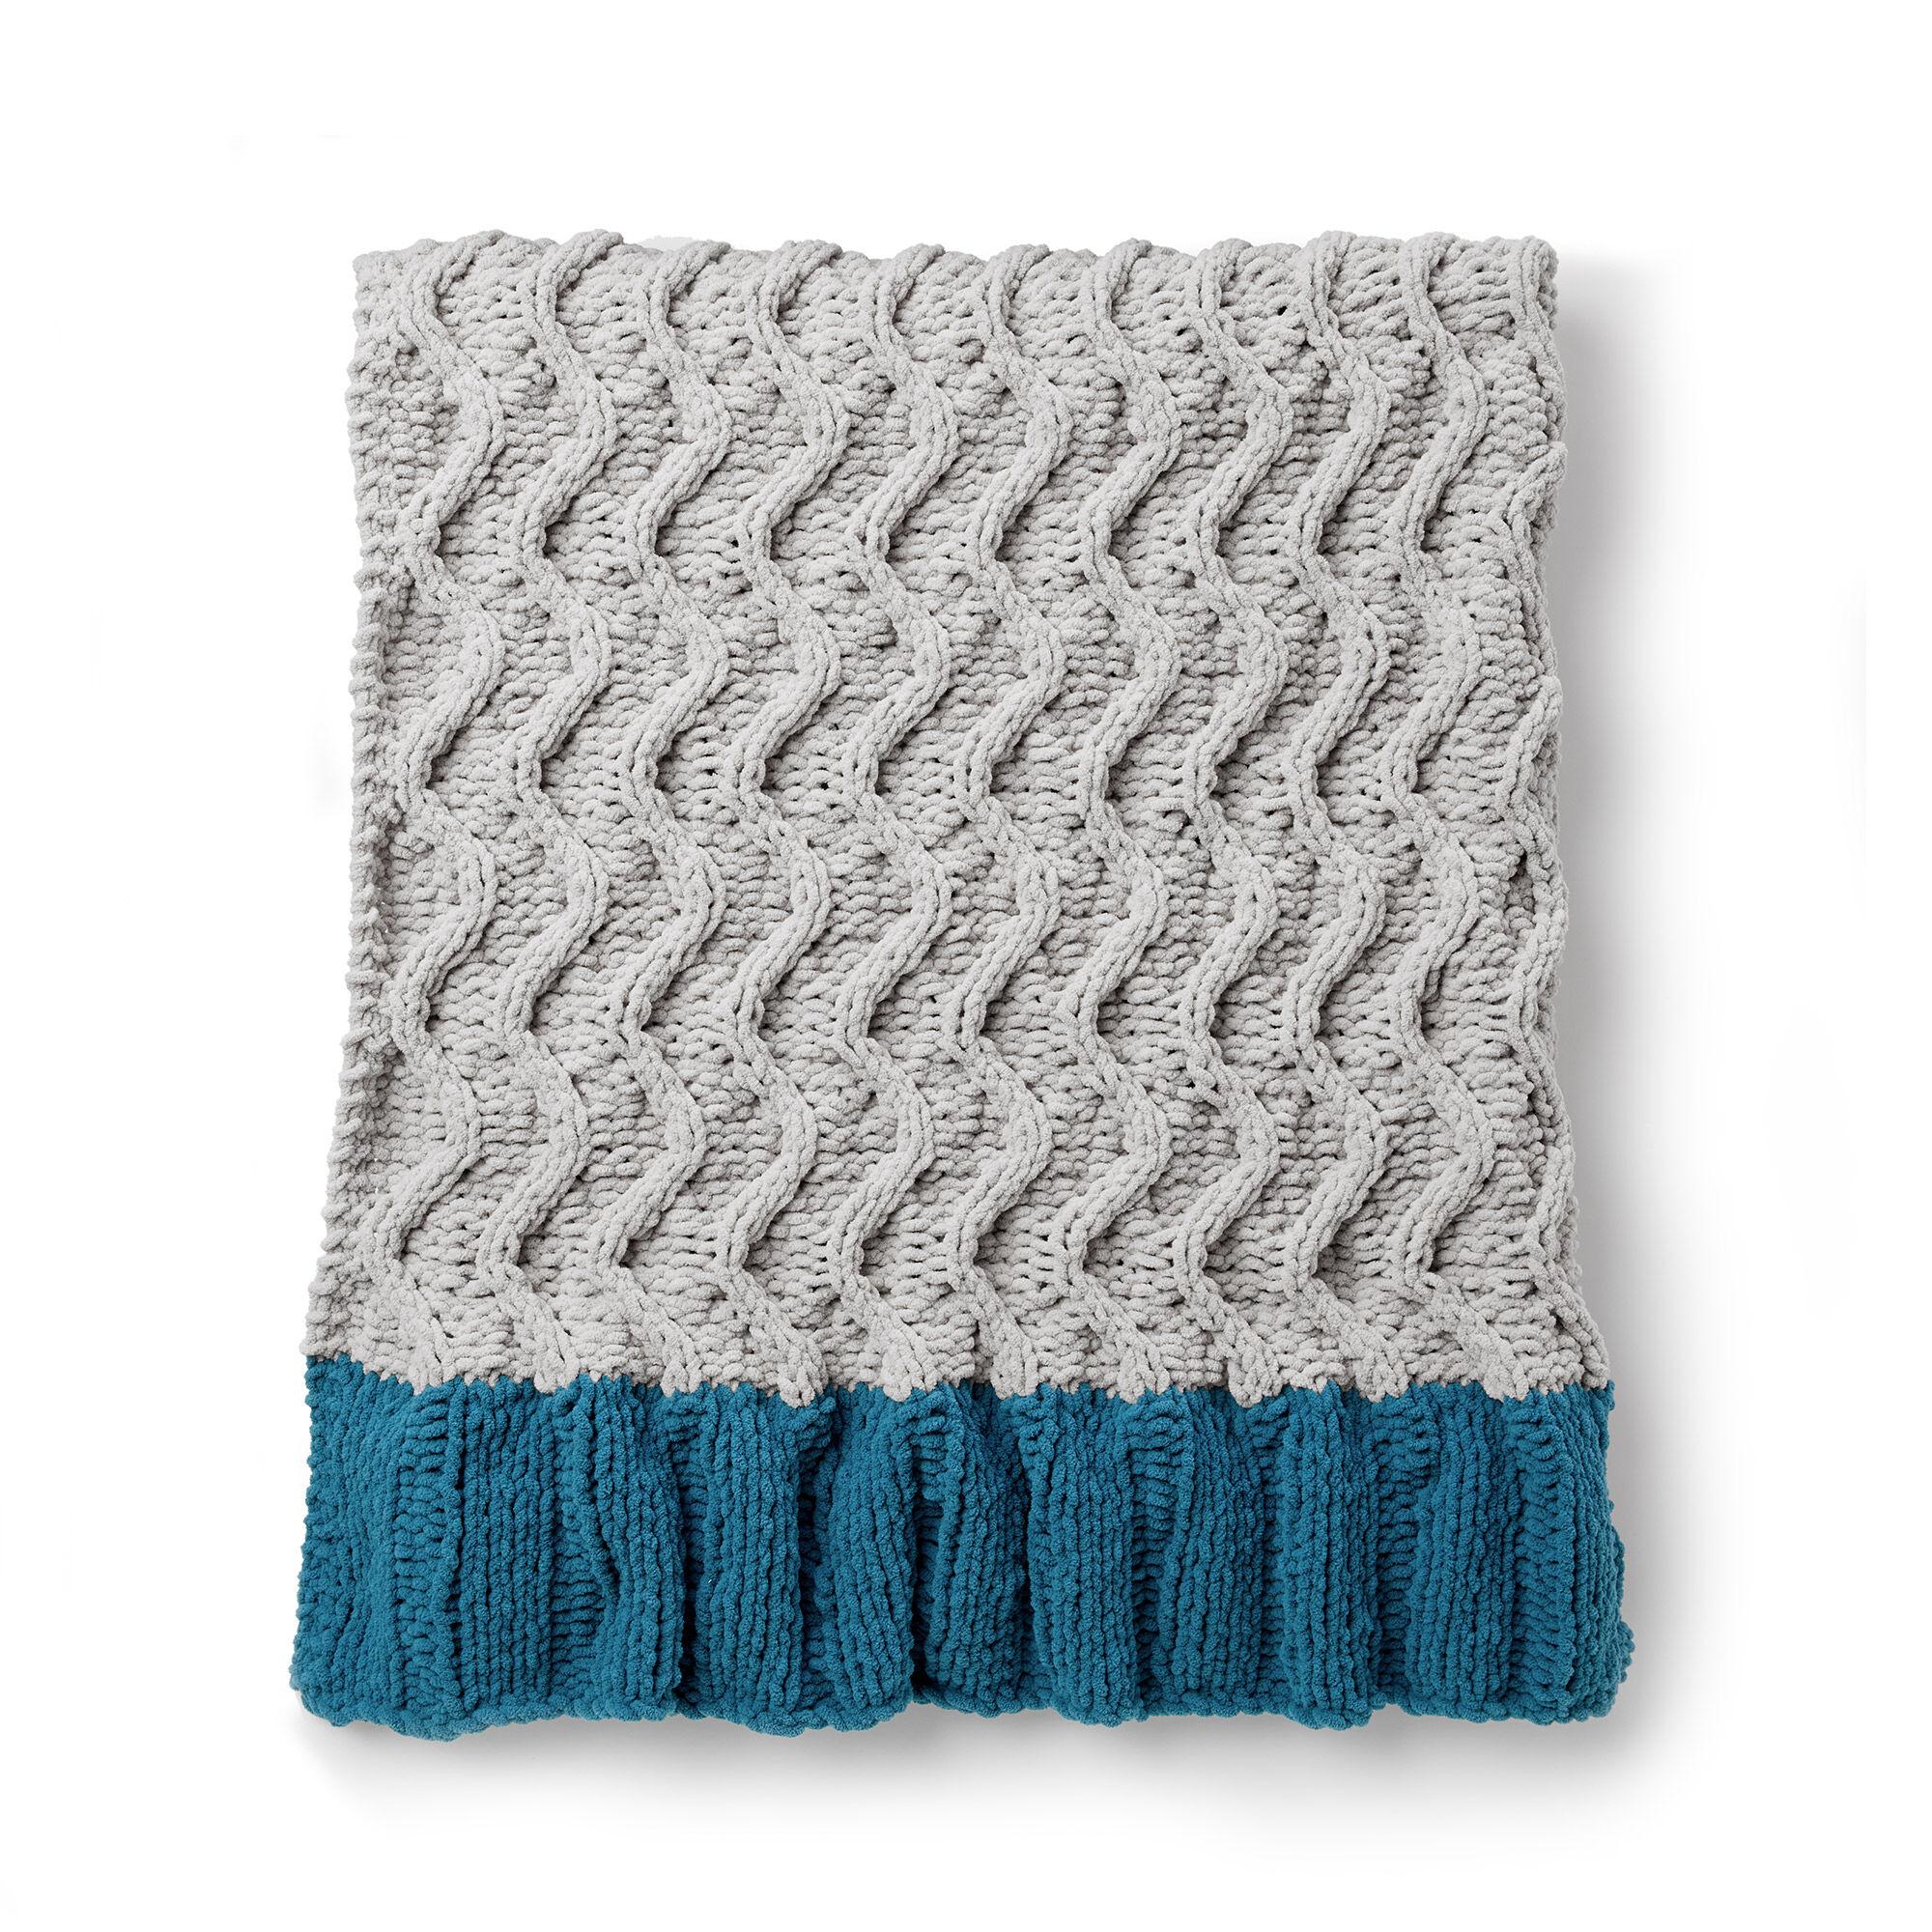 Bernat Zig-Zag Dip Knit Blanket Pattern | Yarnspirations